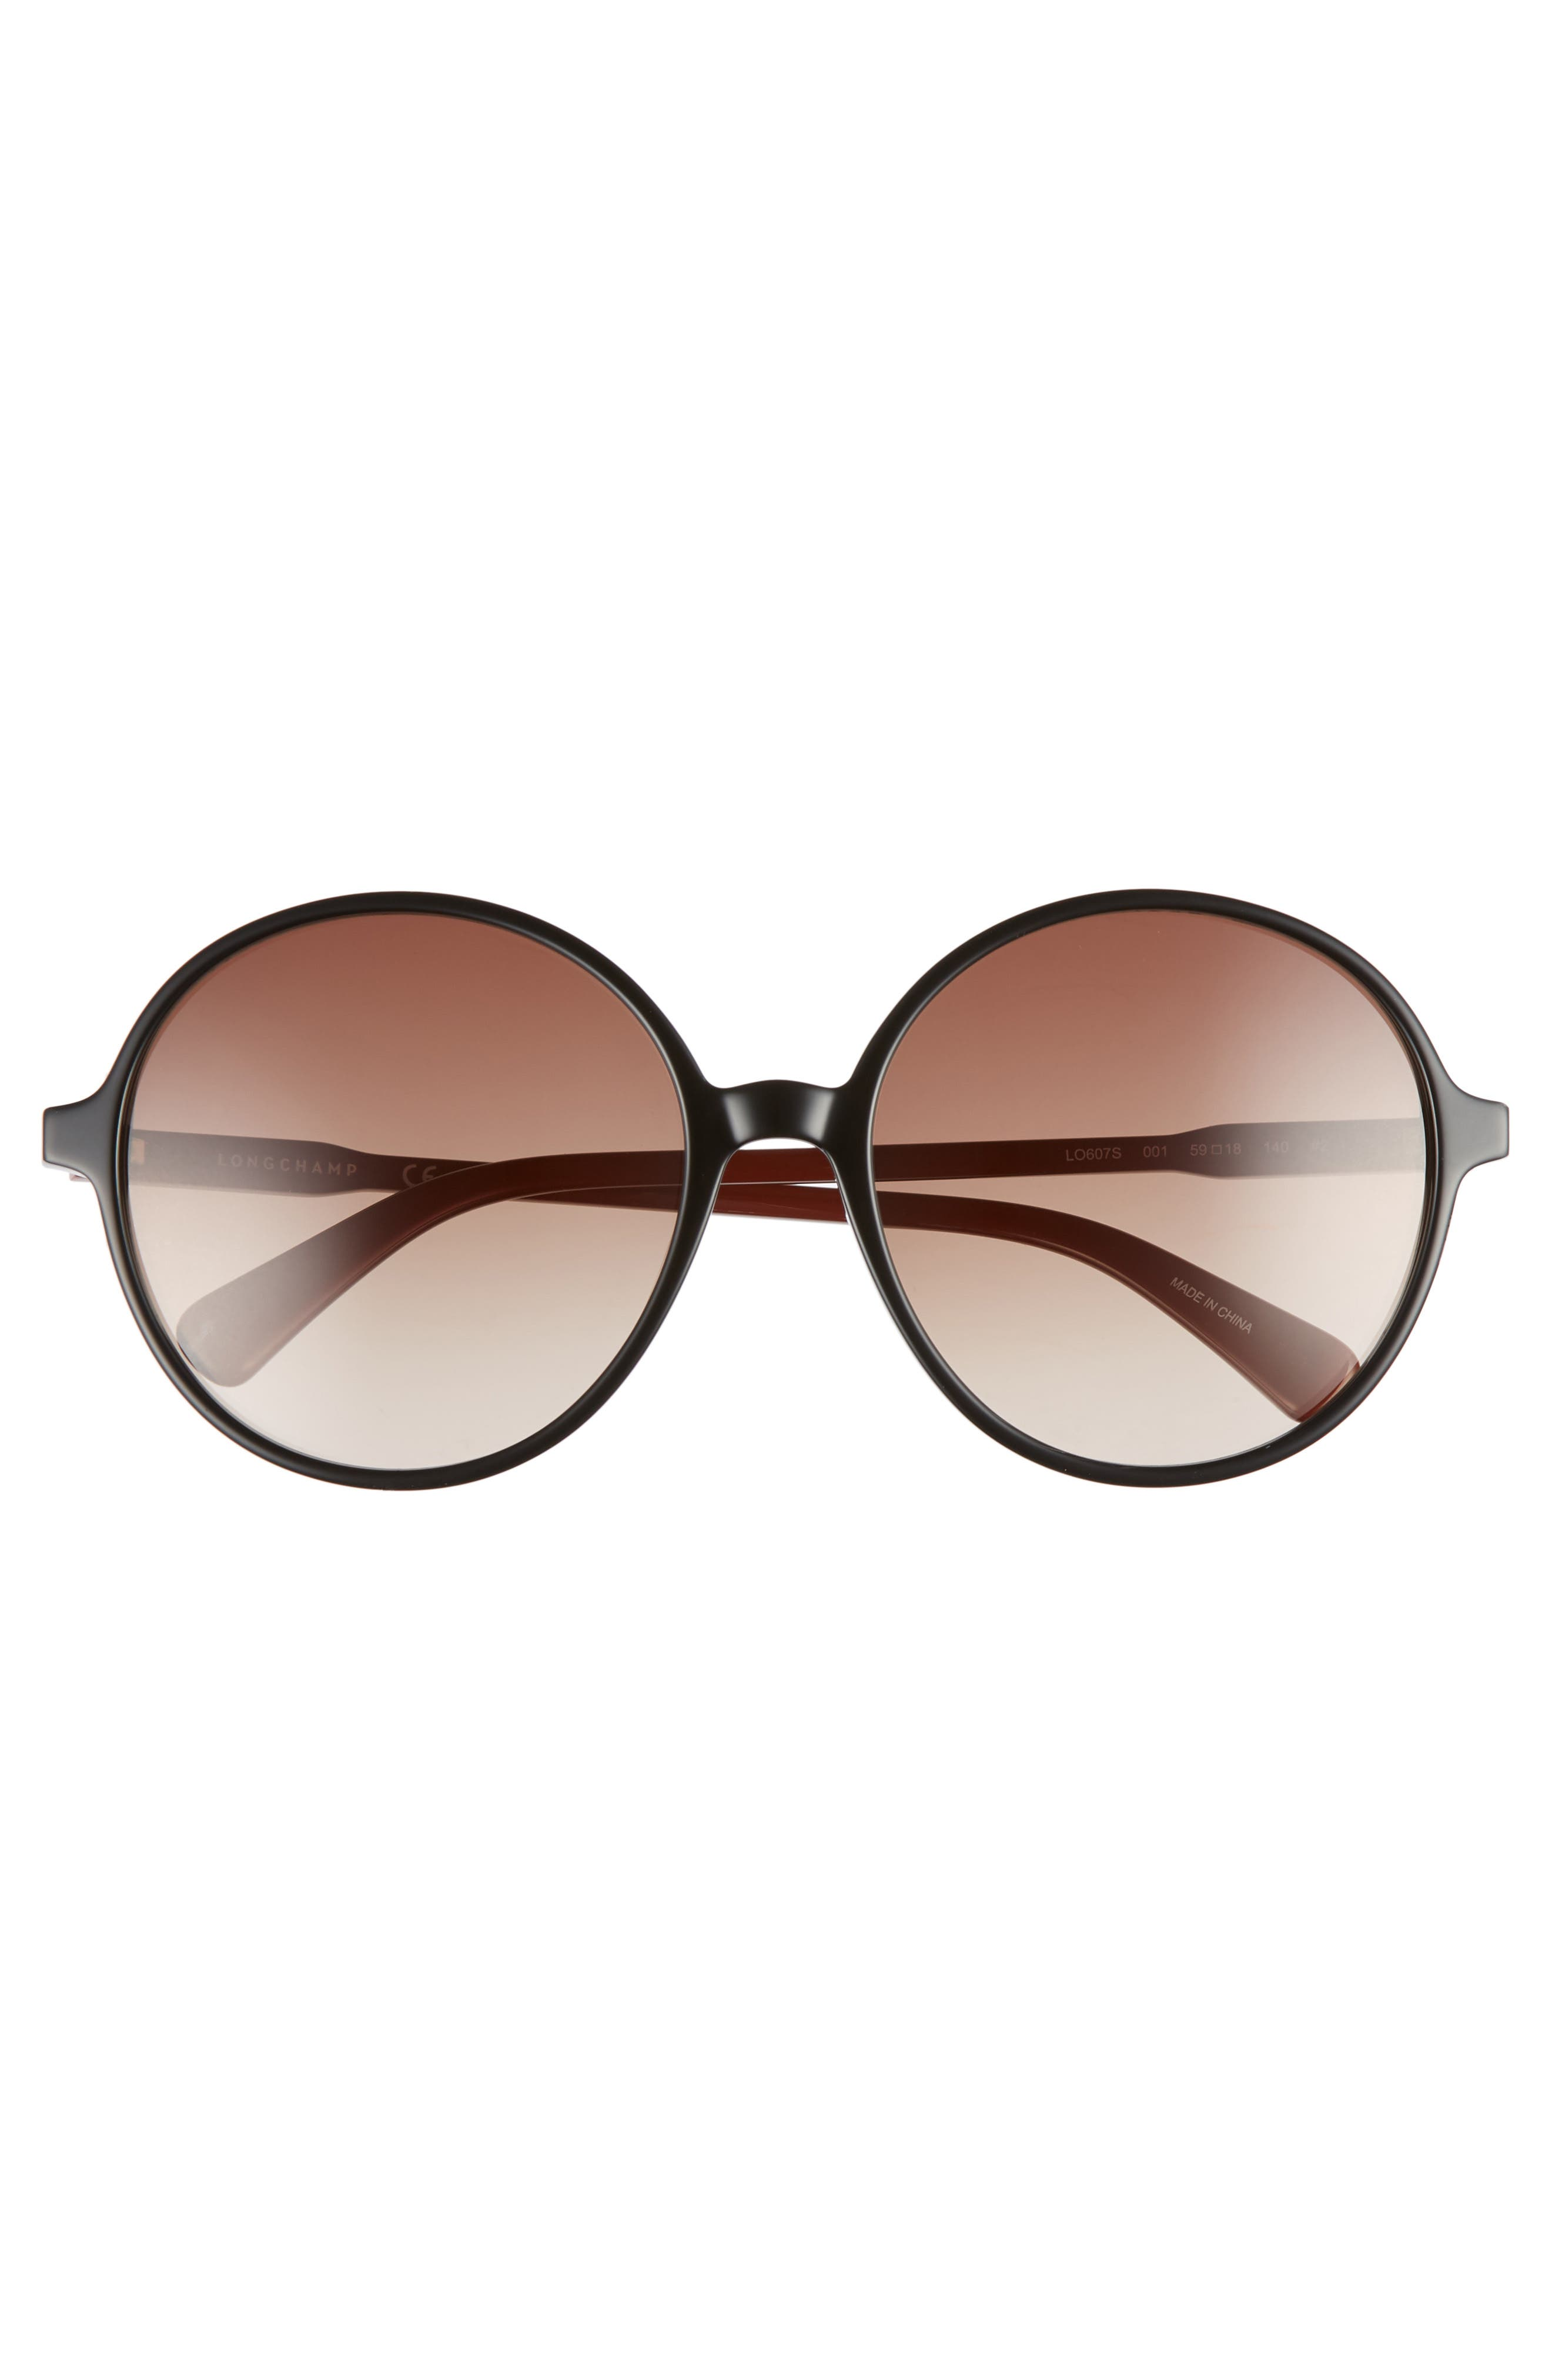 49mm Gradient Round Sunglasses,                             Alternate thumbnail 3, color,                             BLACK